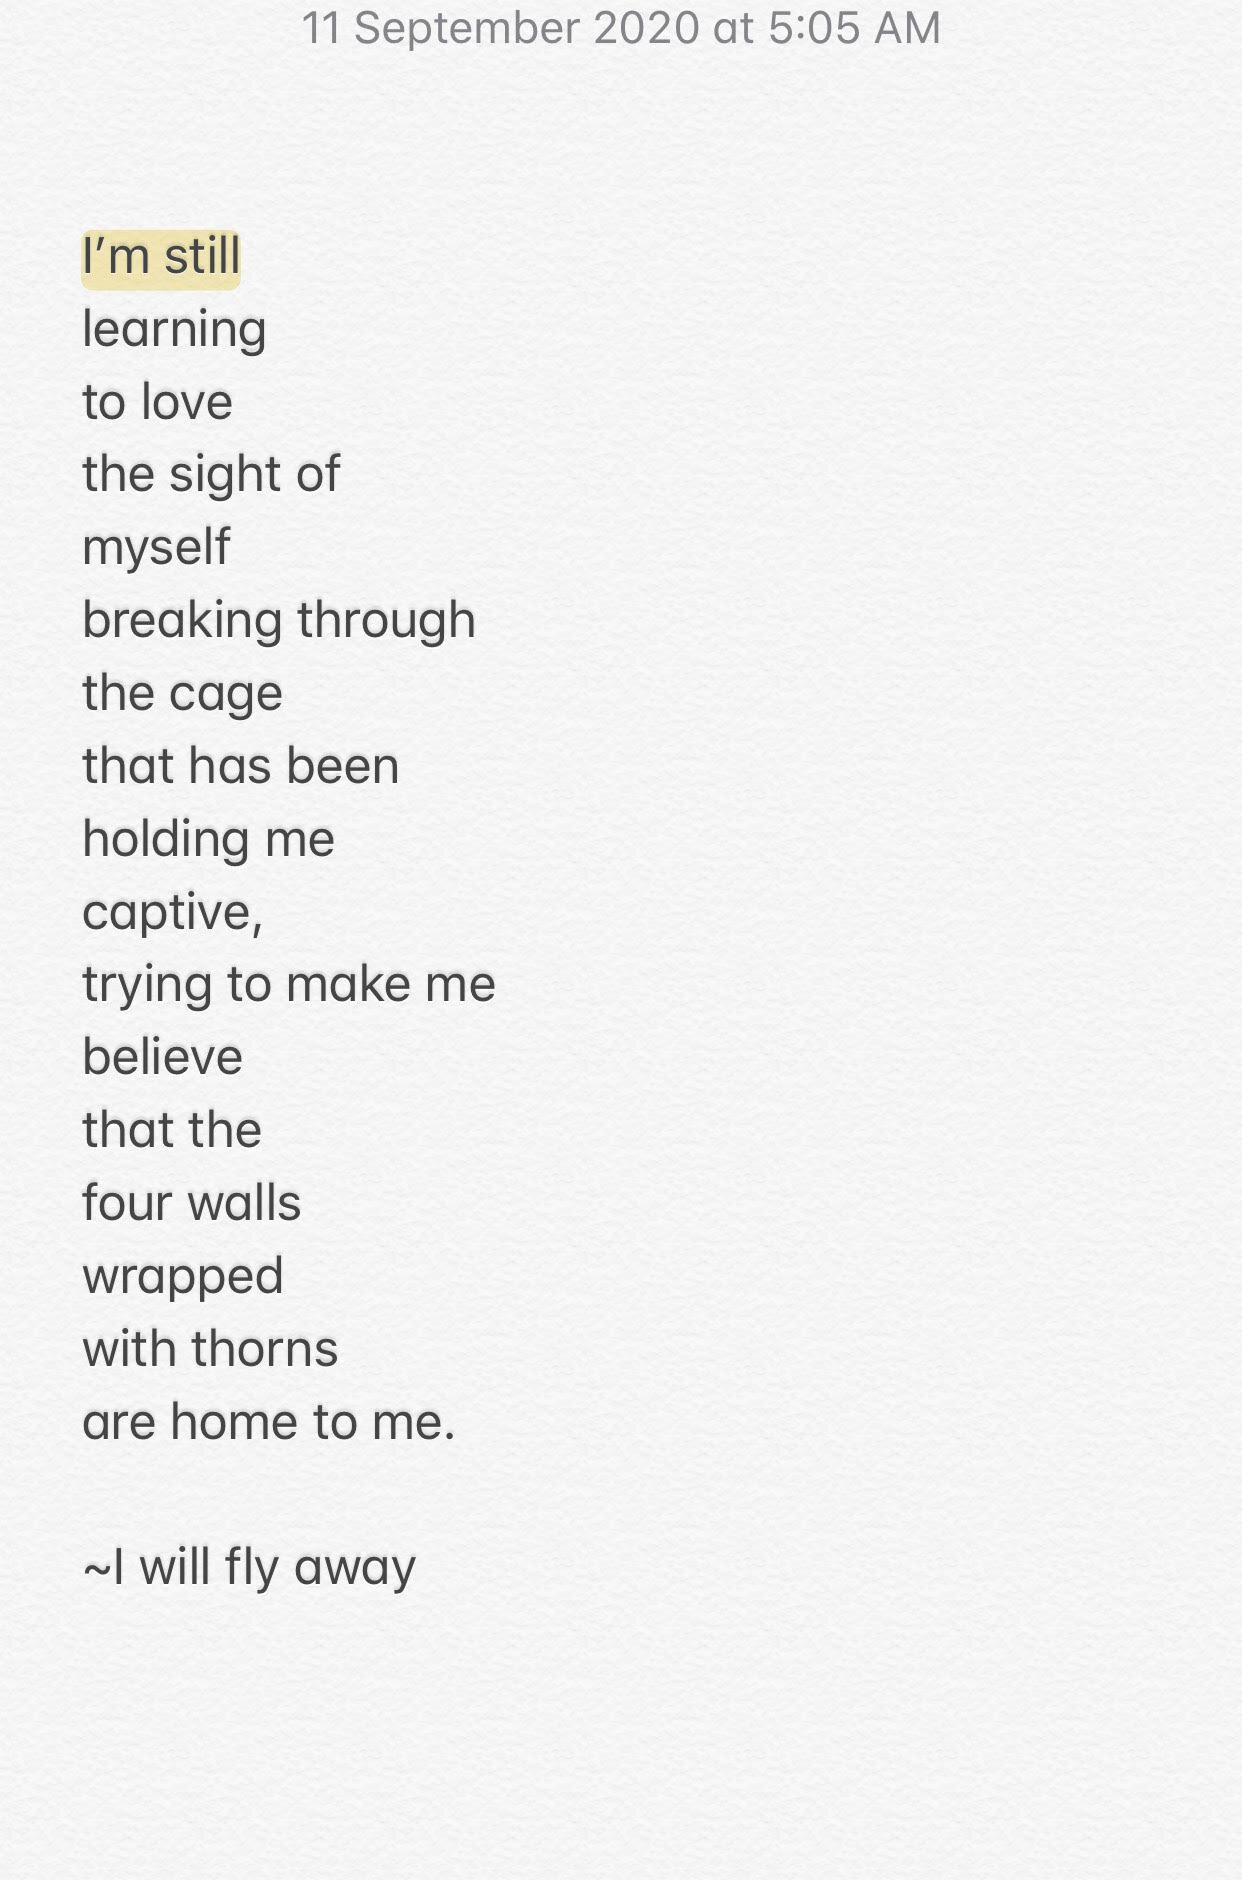 AsiaIssue_Poetry_NimraNaseem_2.jpg